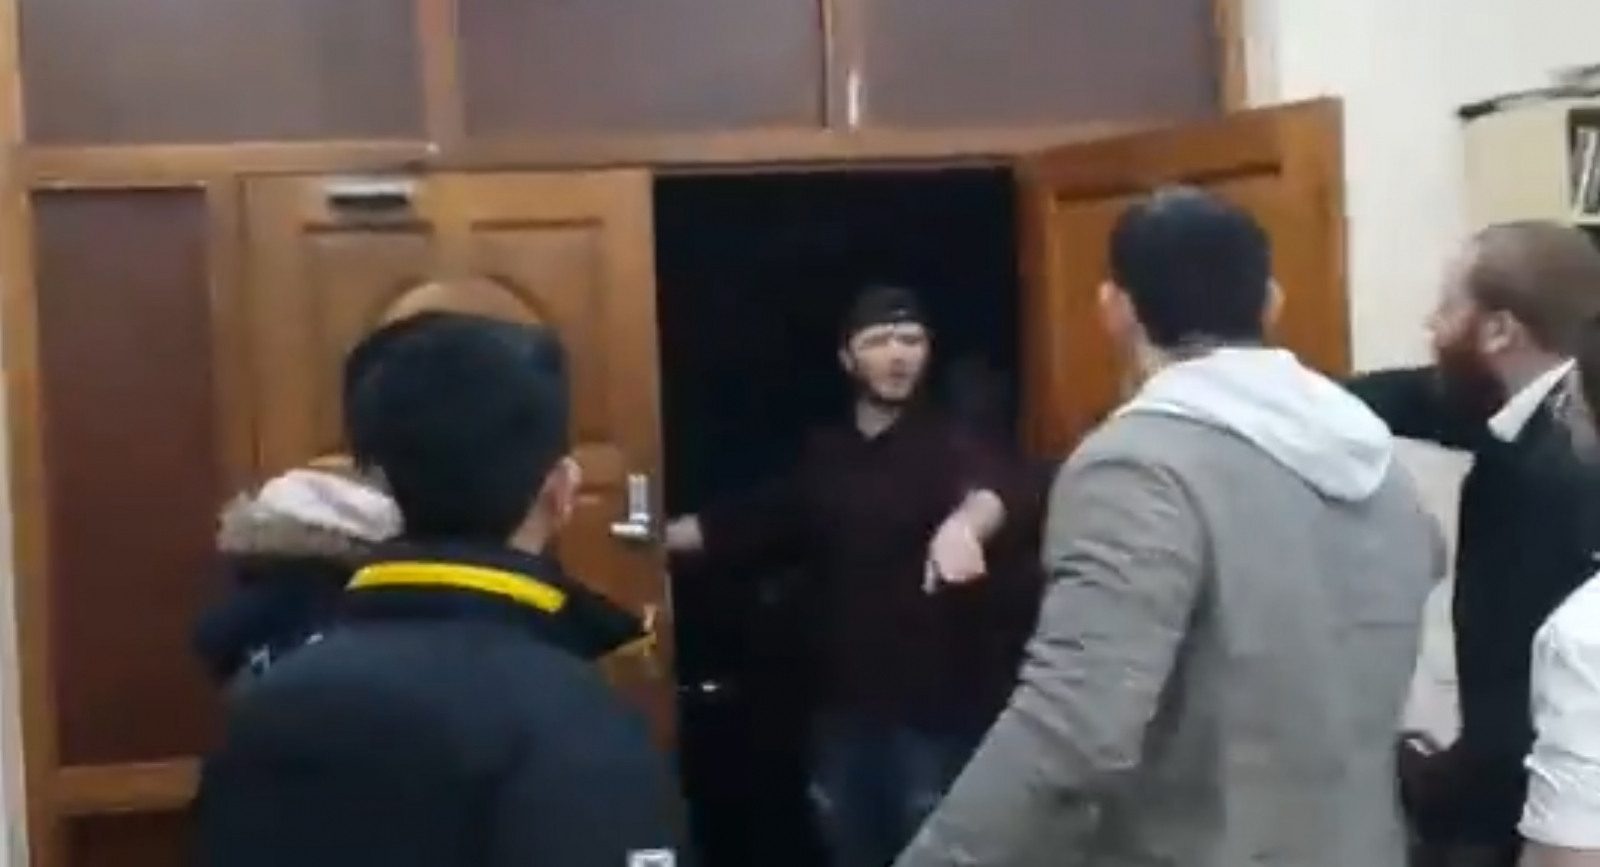 Stamford Hill anti-Semitic attack 2